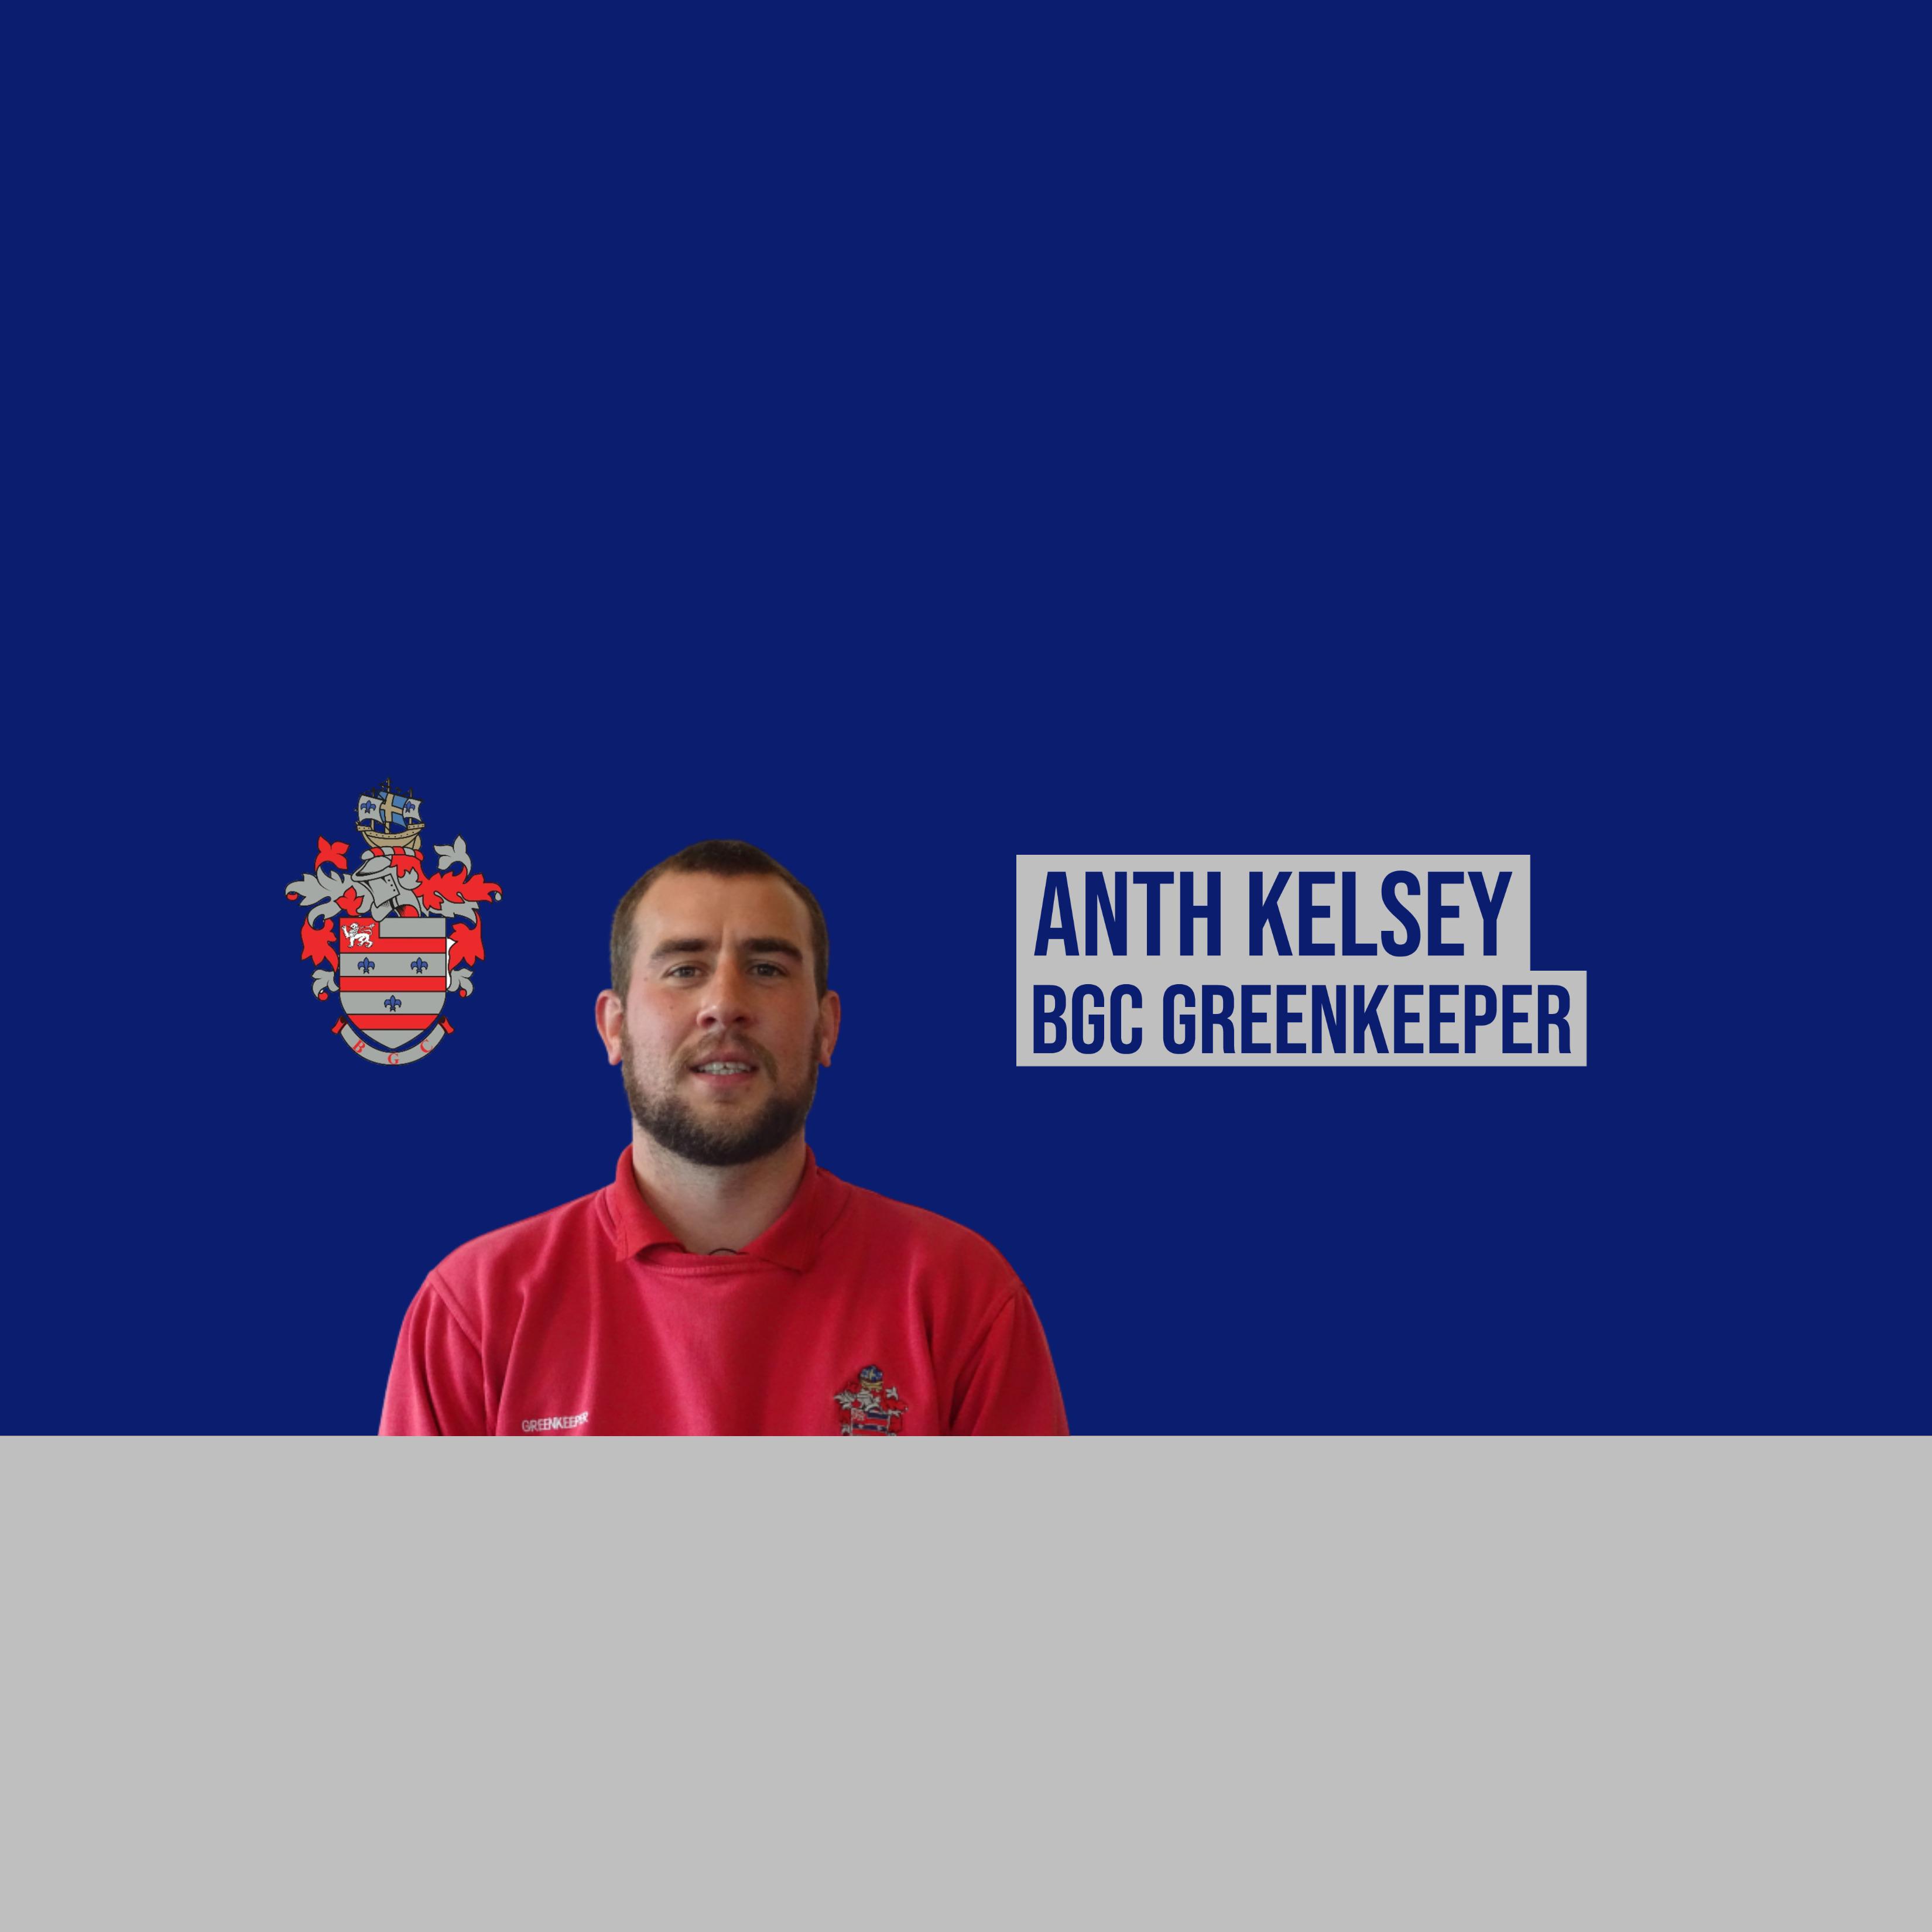 Anth Kelsey (BGC Greenkeeper)